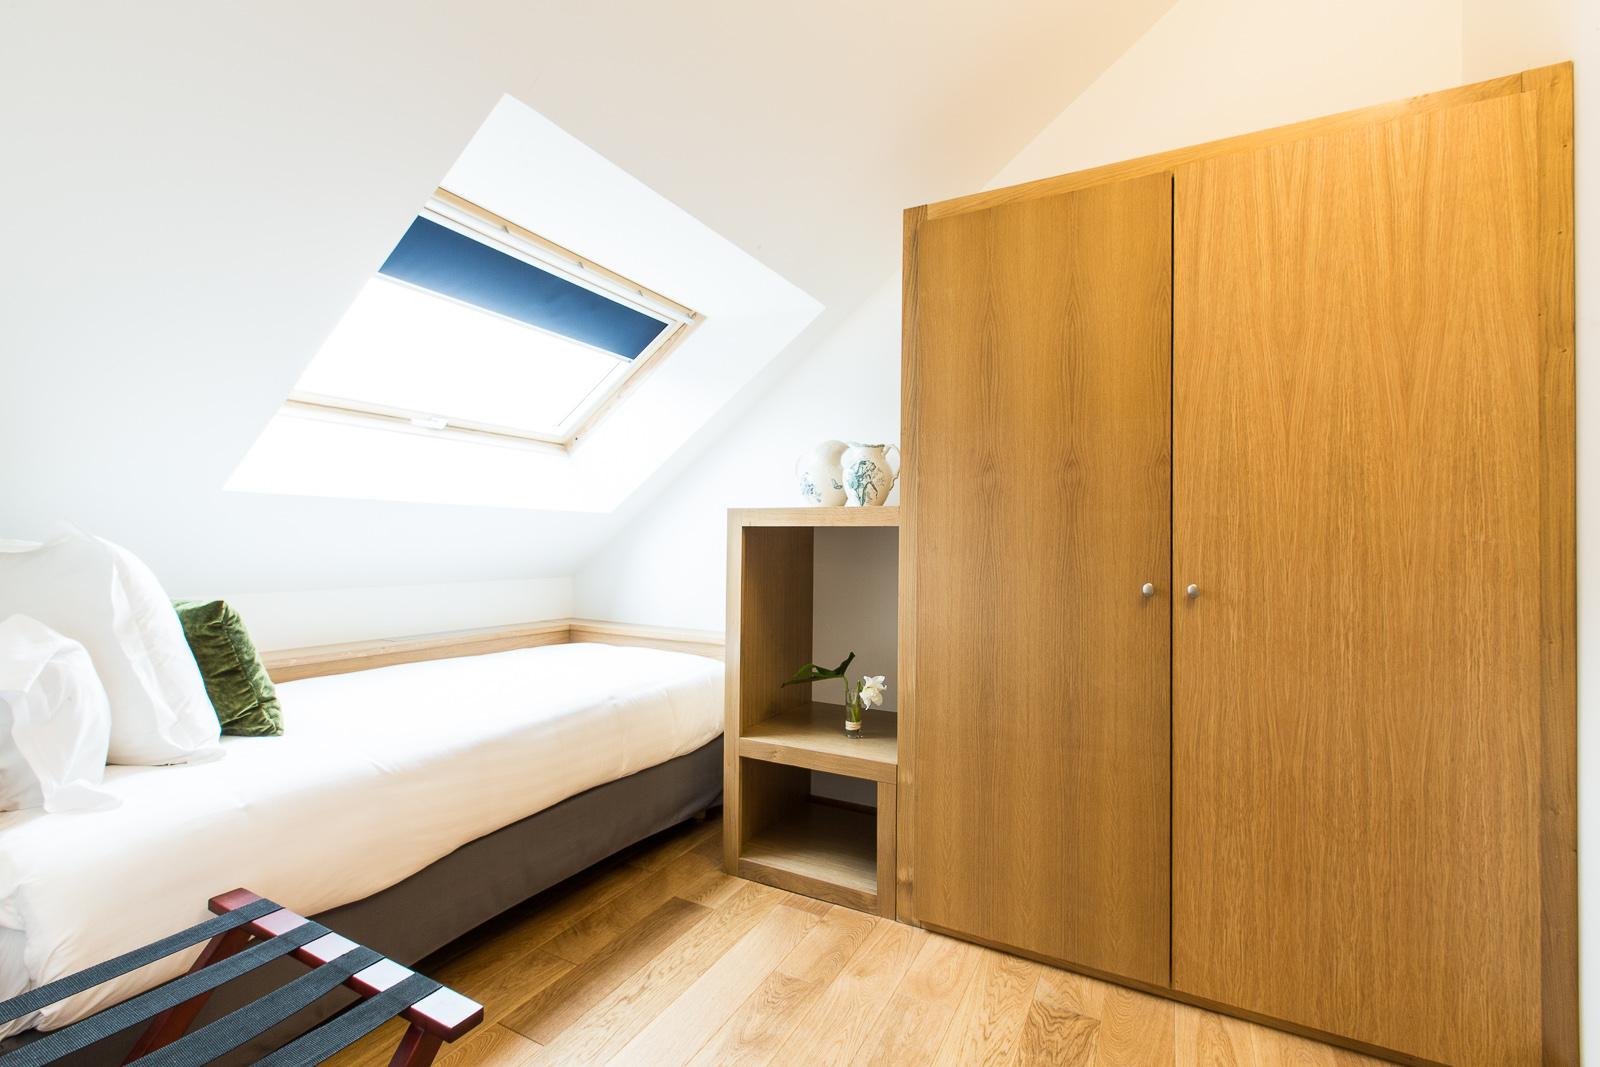 Hotel Marotte chalet lit simple